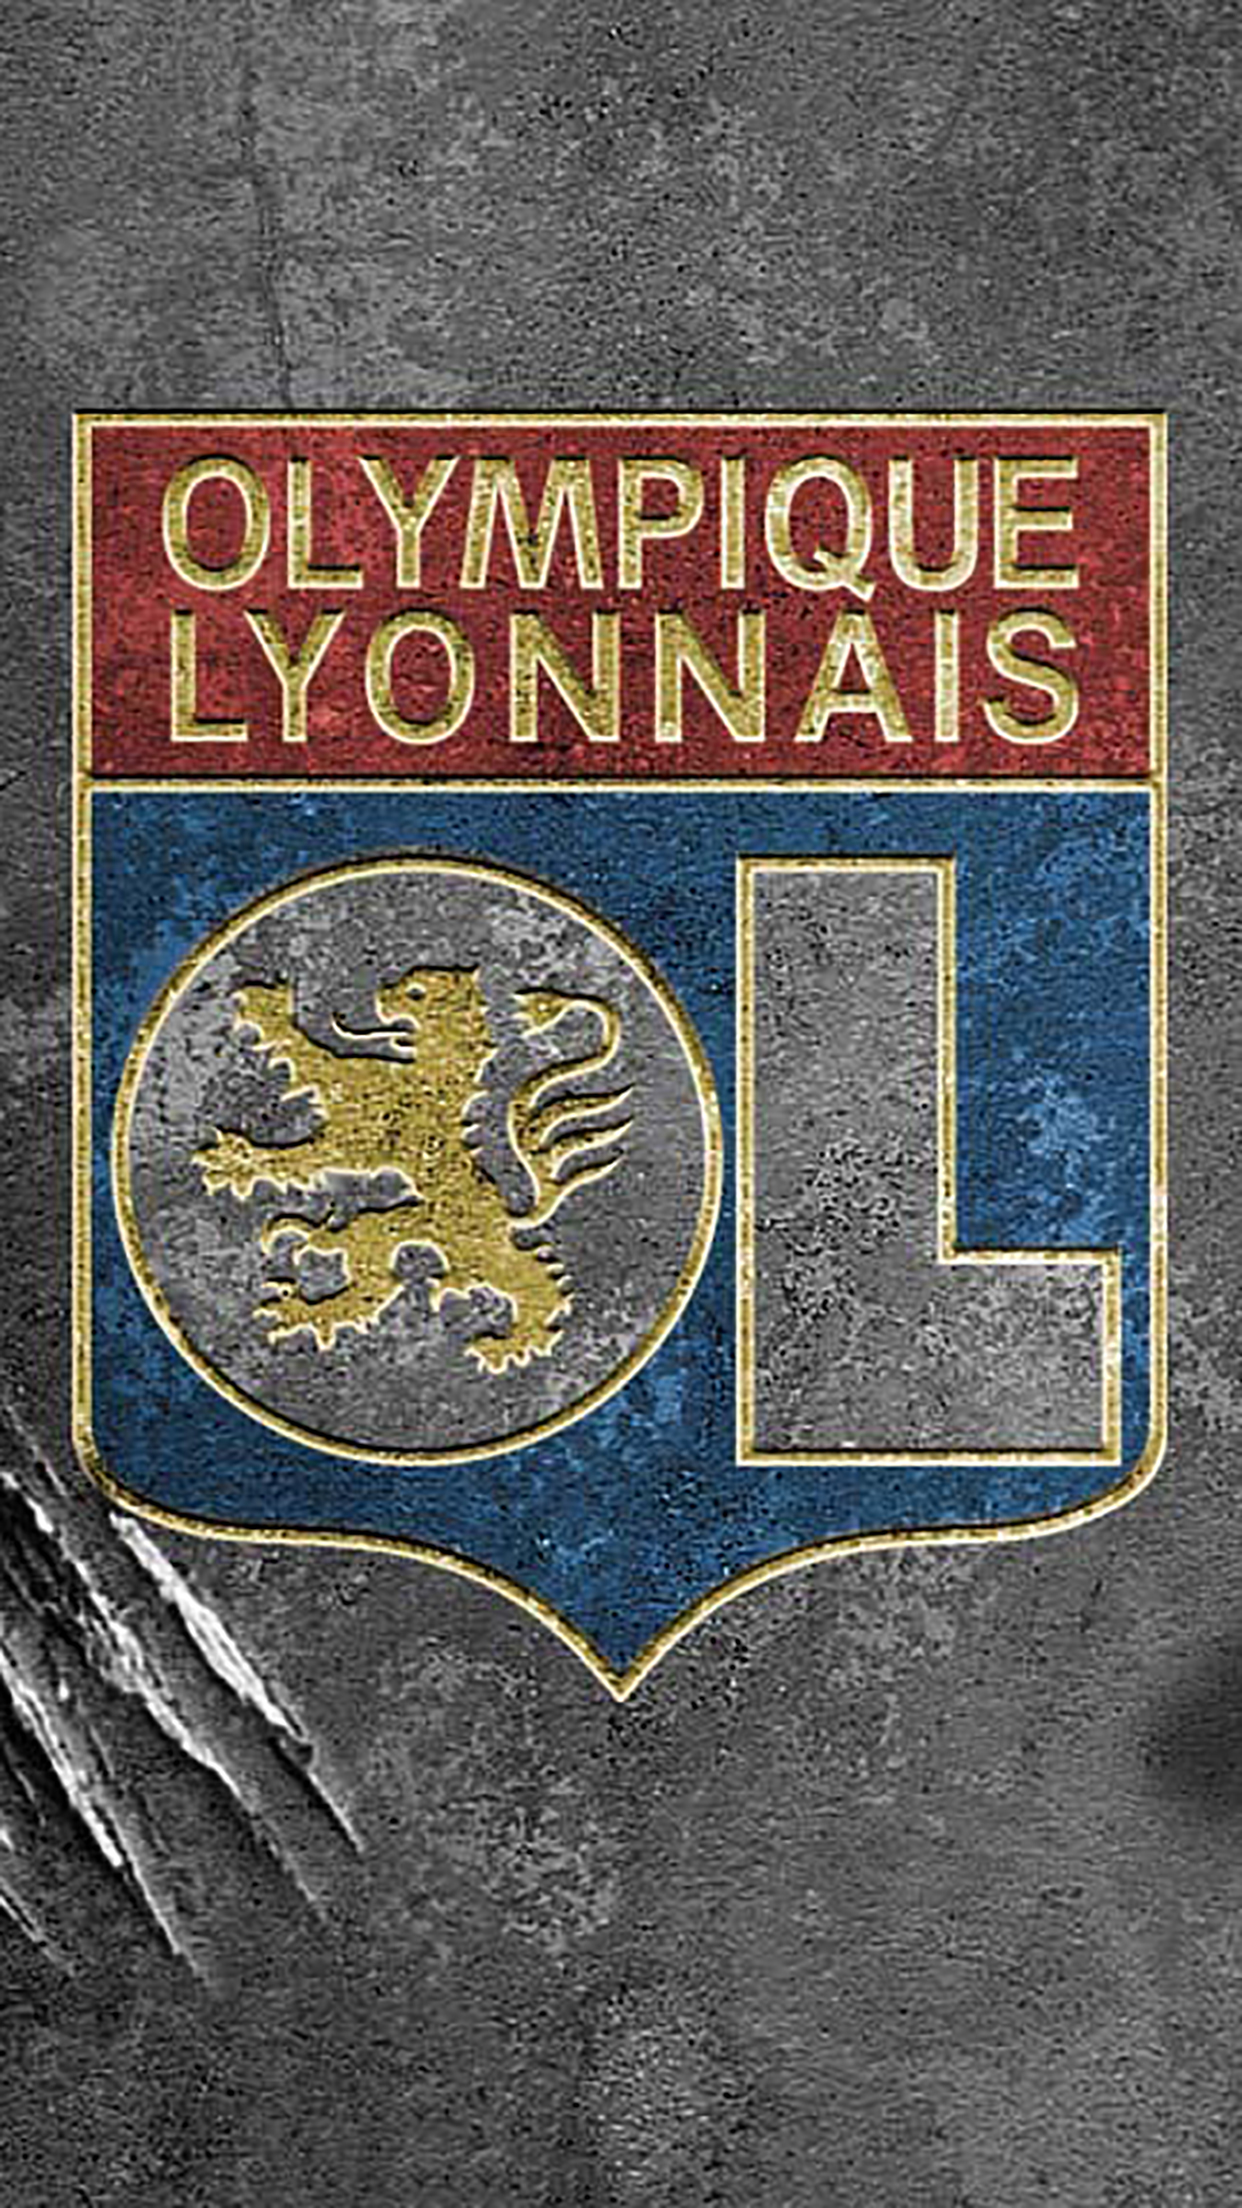 Olympique Lyonnais Logo 2 3Wallpapers iPhone Parallax Olympique Lyonnais : Logo 2